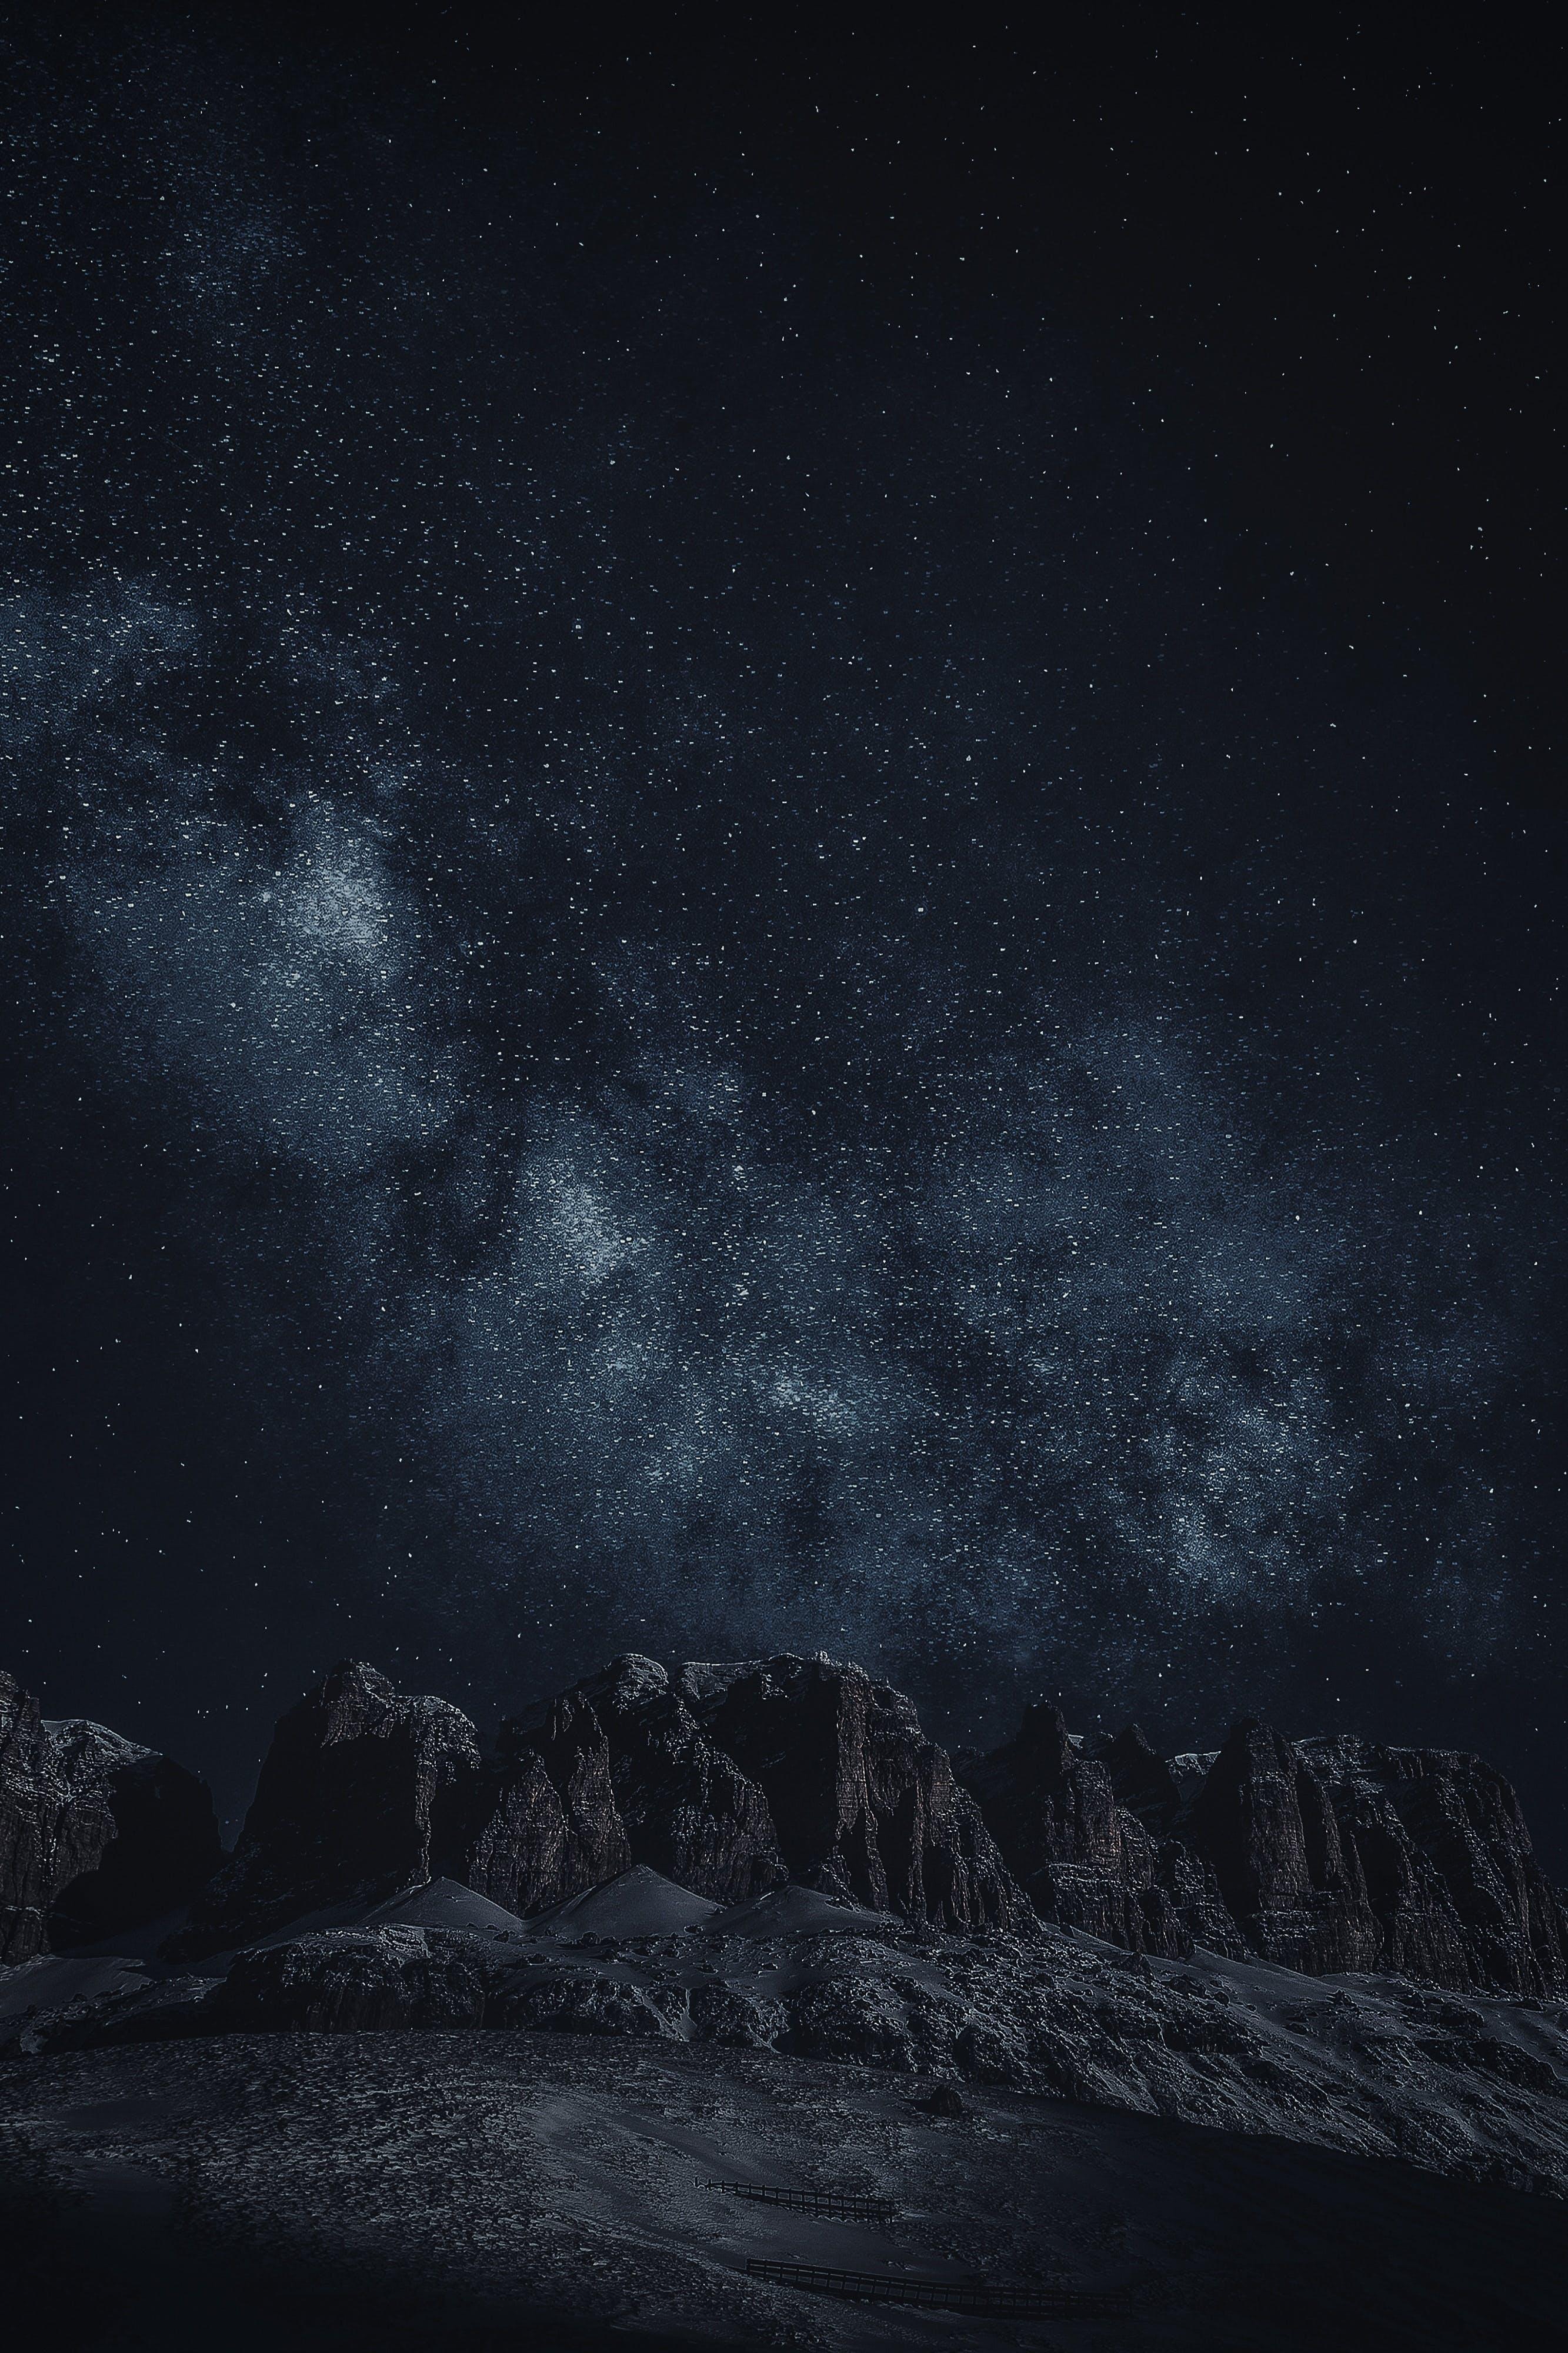 Kostenloses Stock Foto zu abend, astrologie, astronomie, berg